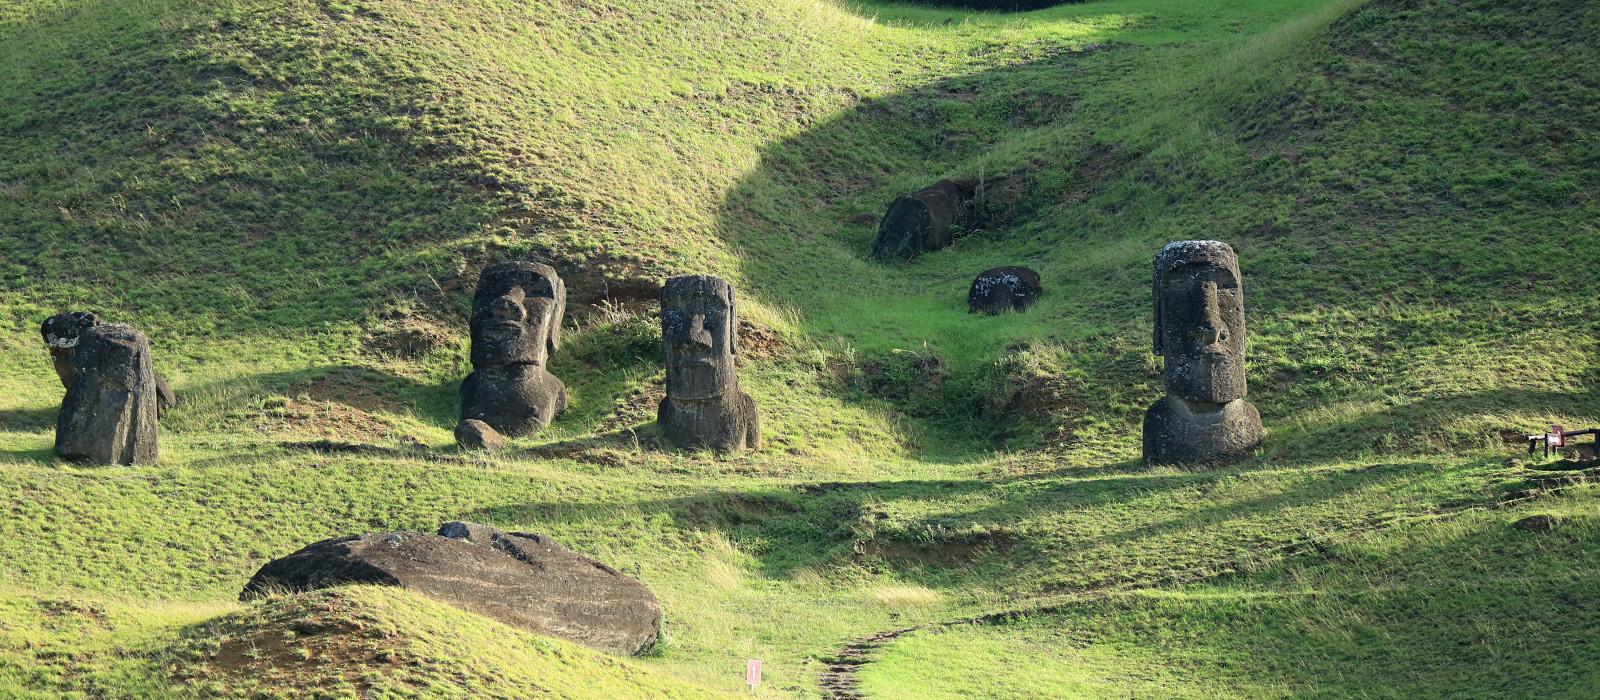 Hundreds of abandoned Moai statue on Rano Raraku volcano, Easter Island, Archaeological UNESCO World Heritage site of Chile, South America